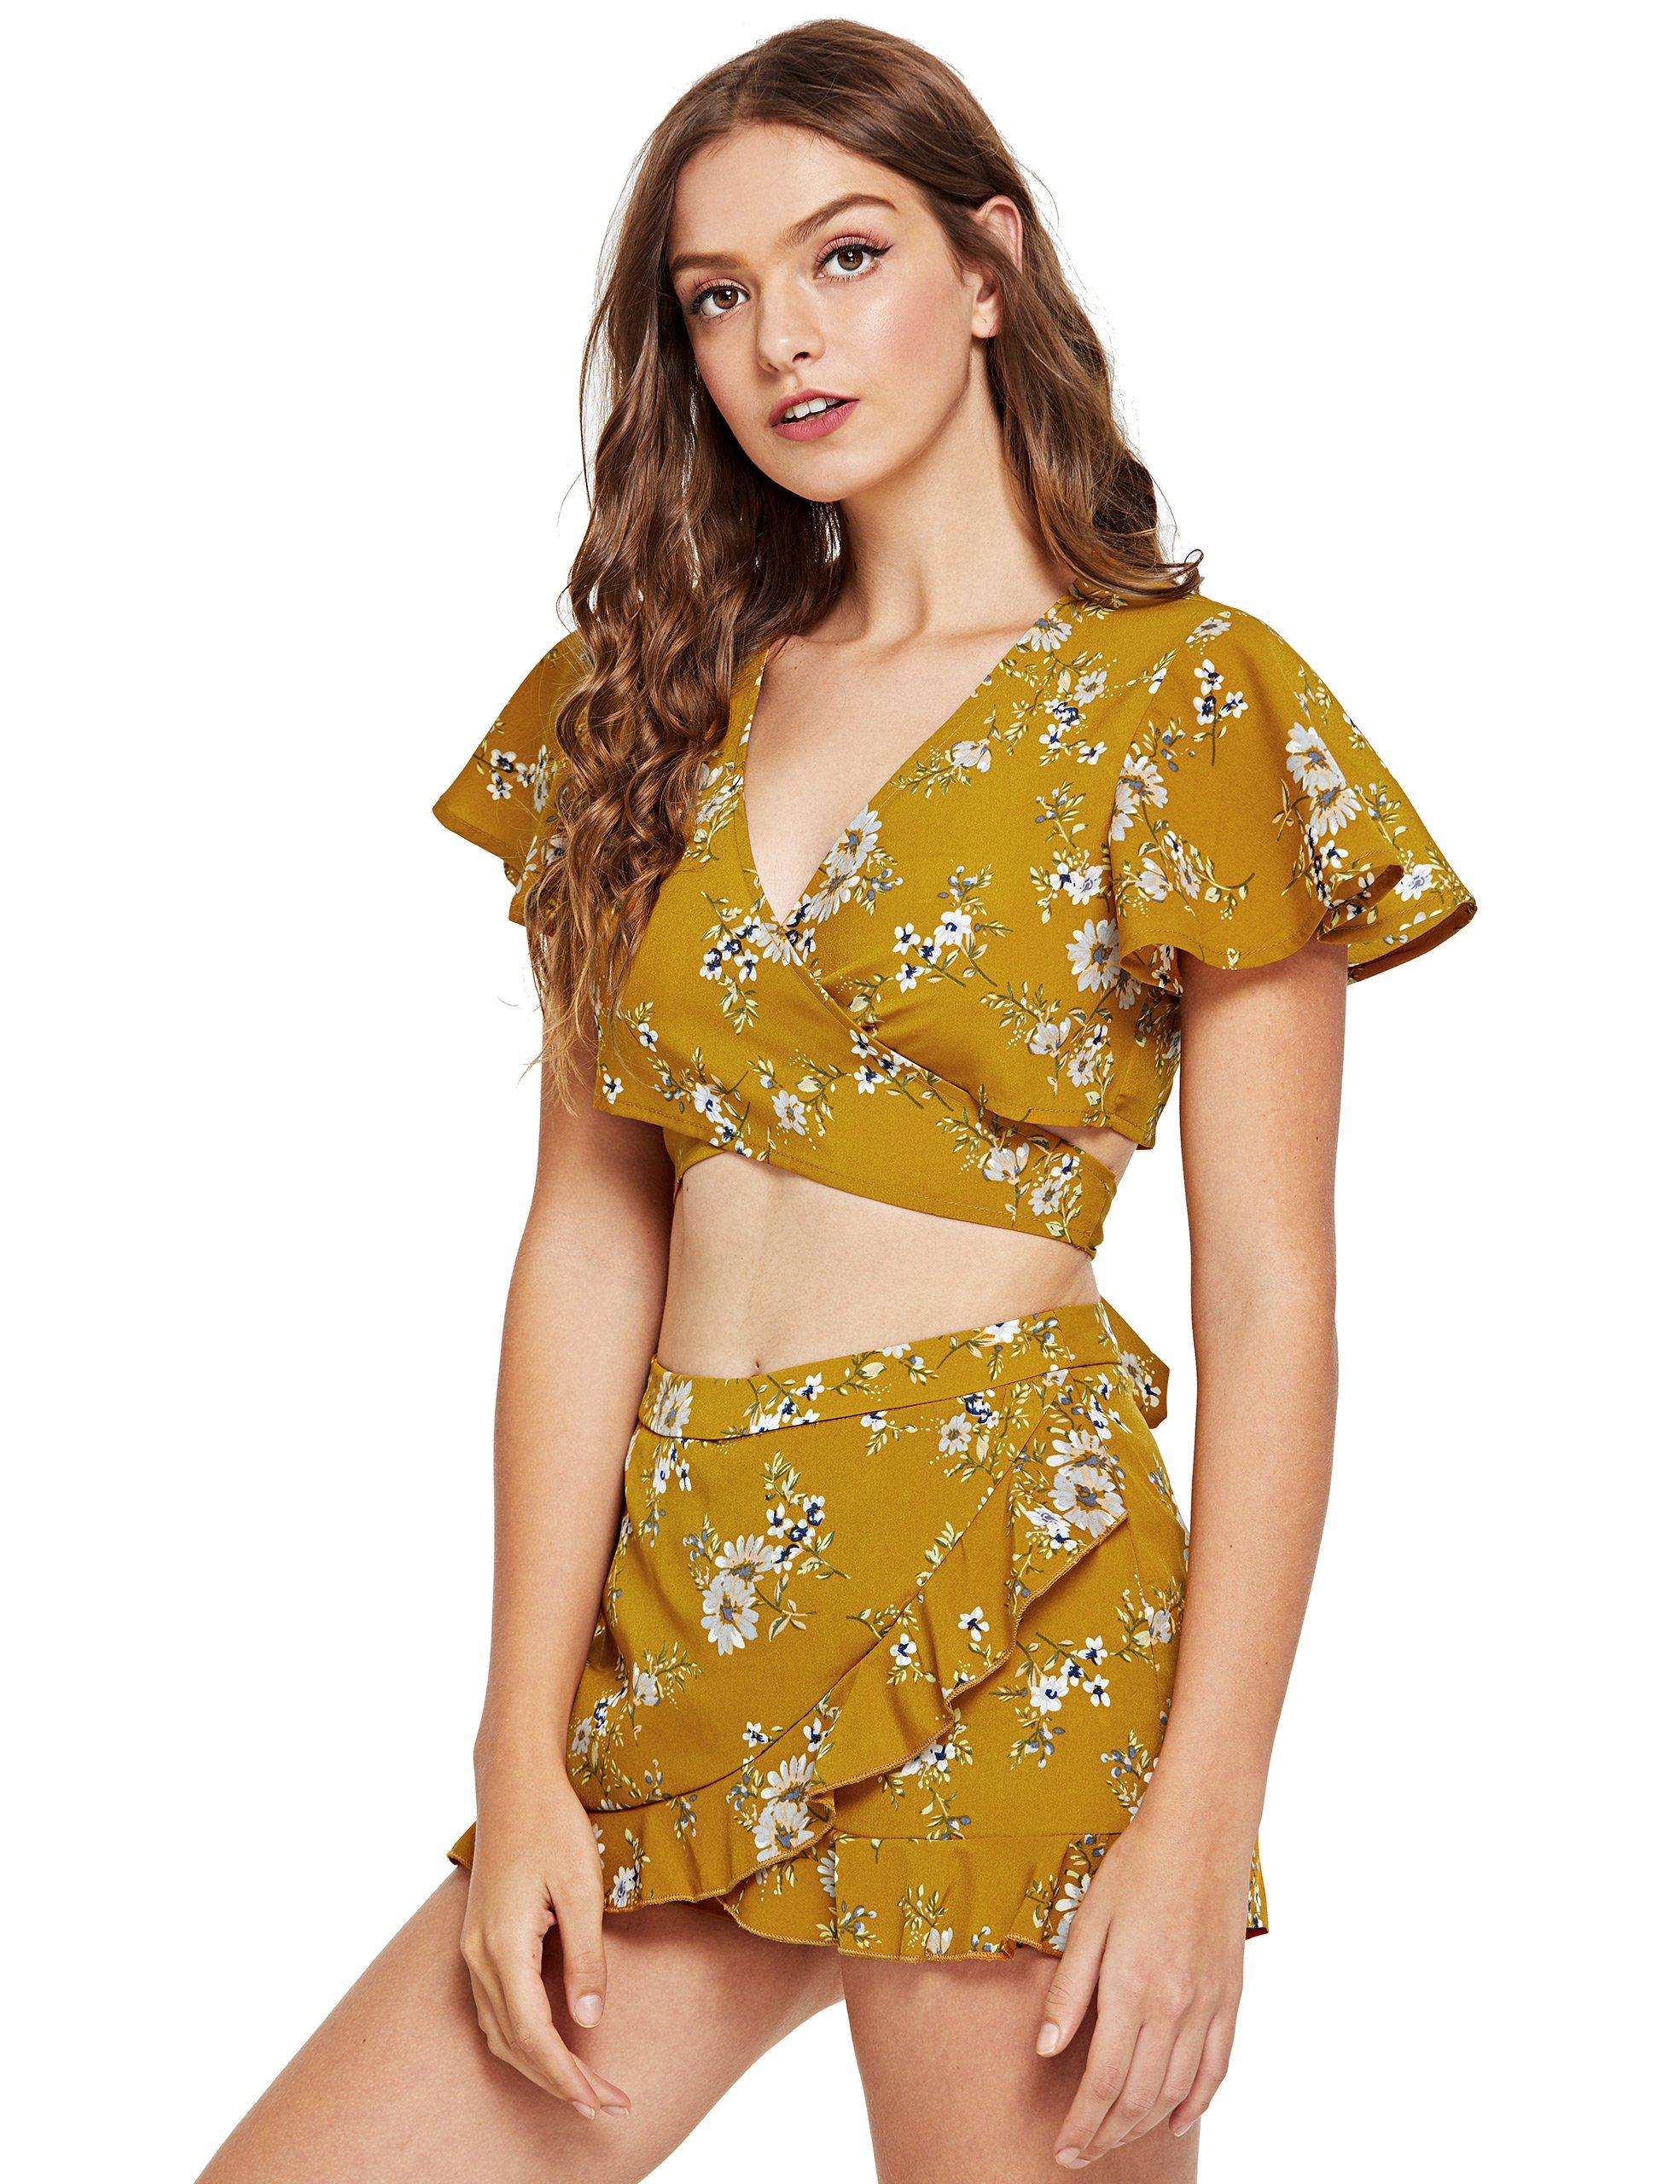 SweatyRocks Women's 2 Piece Boho Floral Print Short Sleeve Crop Top with Shorts Set Mustard L